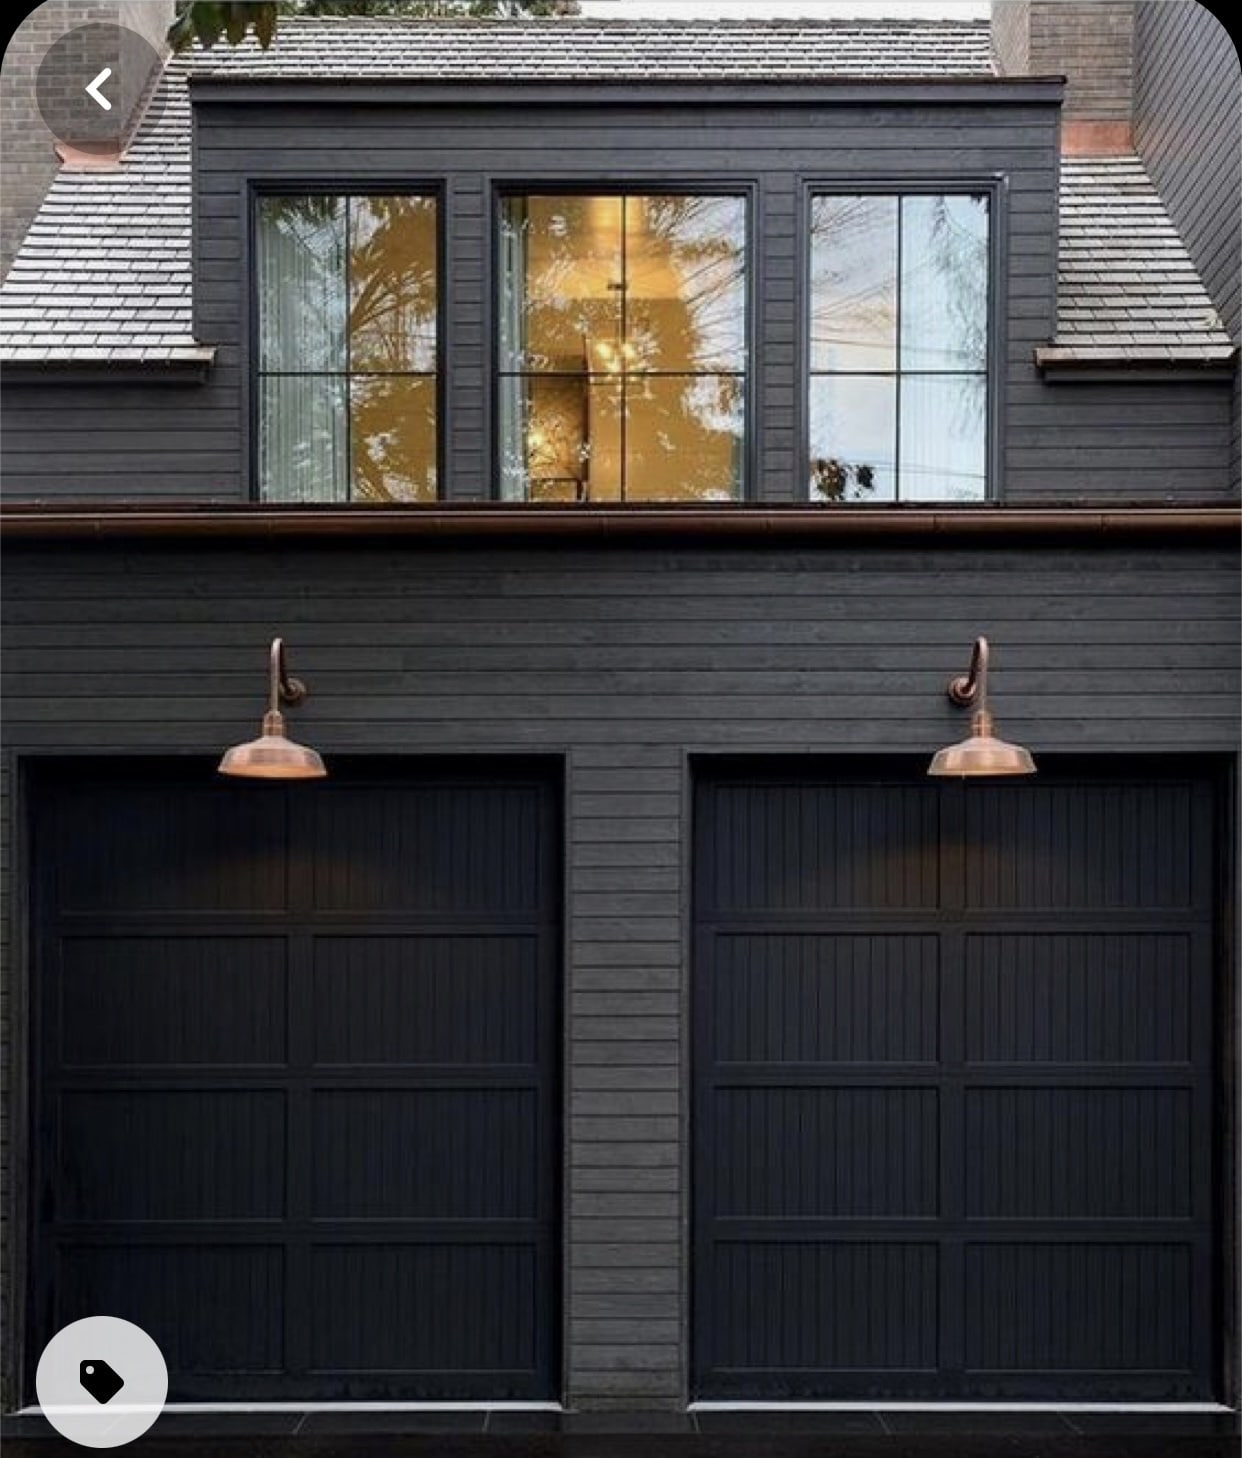 Black Garage doors, Home Decor, New construction, Dark house exterior, Stilettos and Diapers